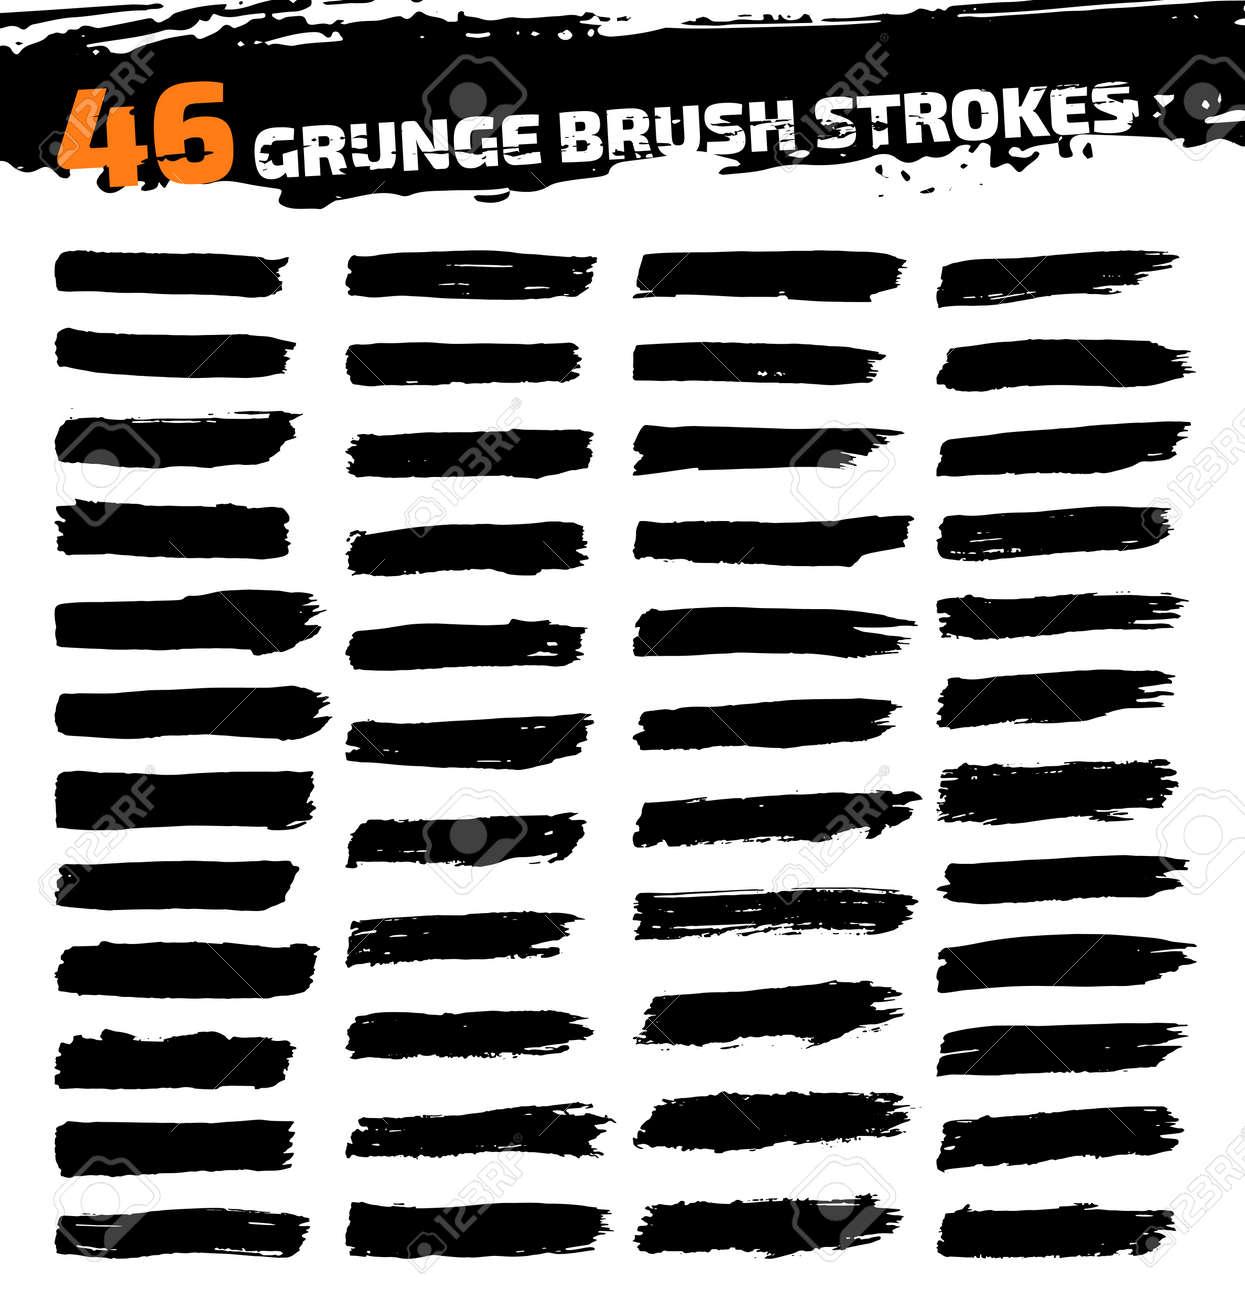 Set of black different grunge brush strokes. Vector illustration - 39262731